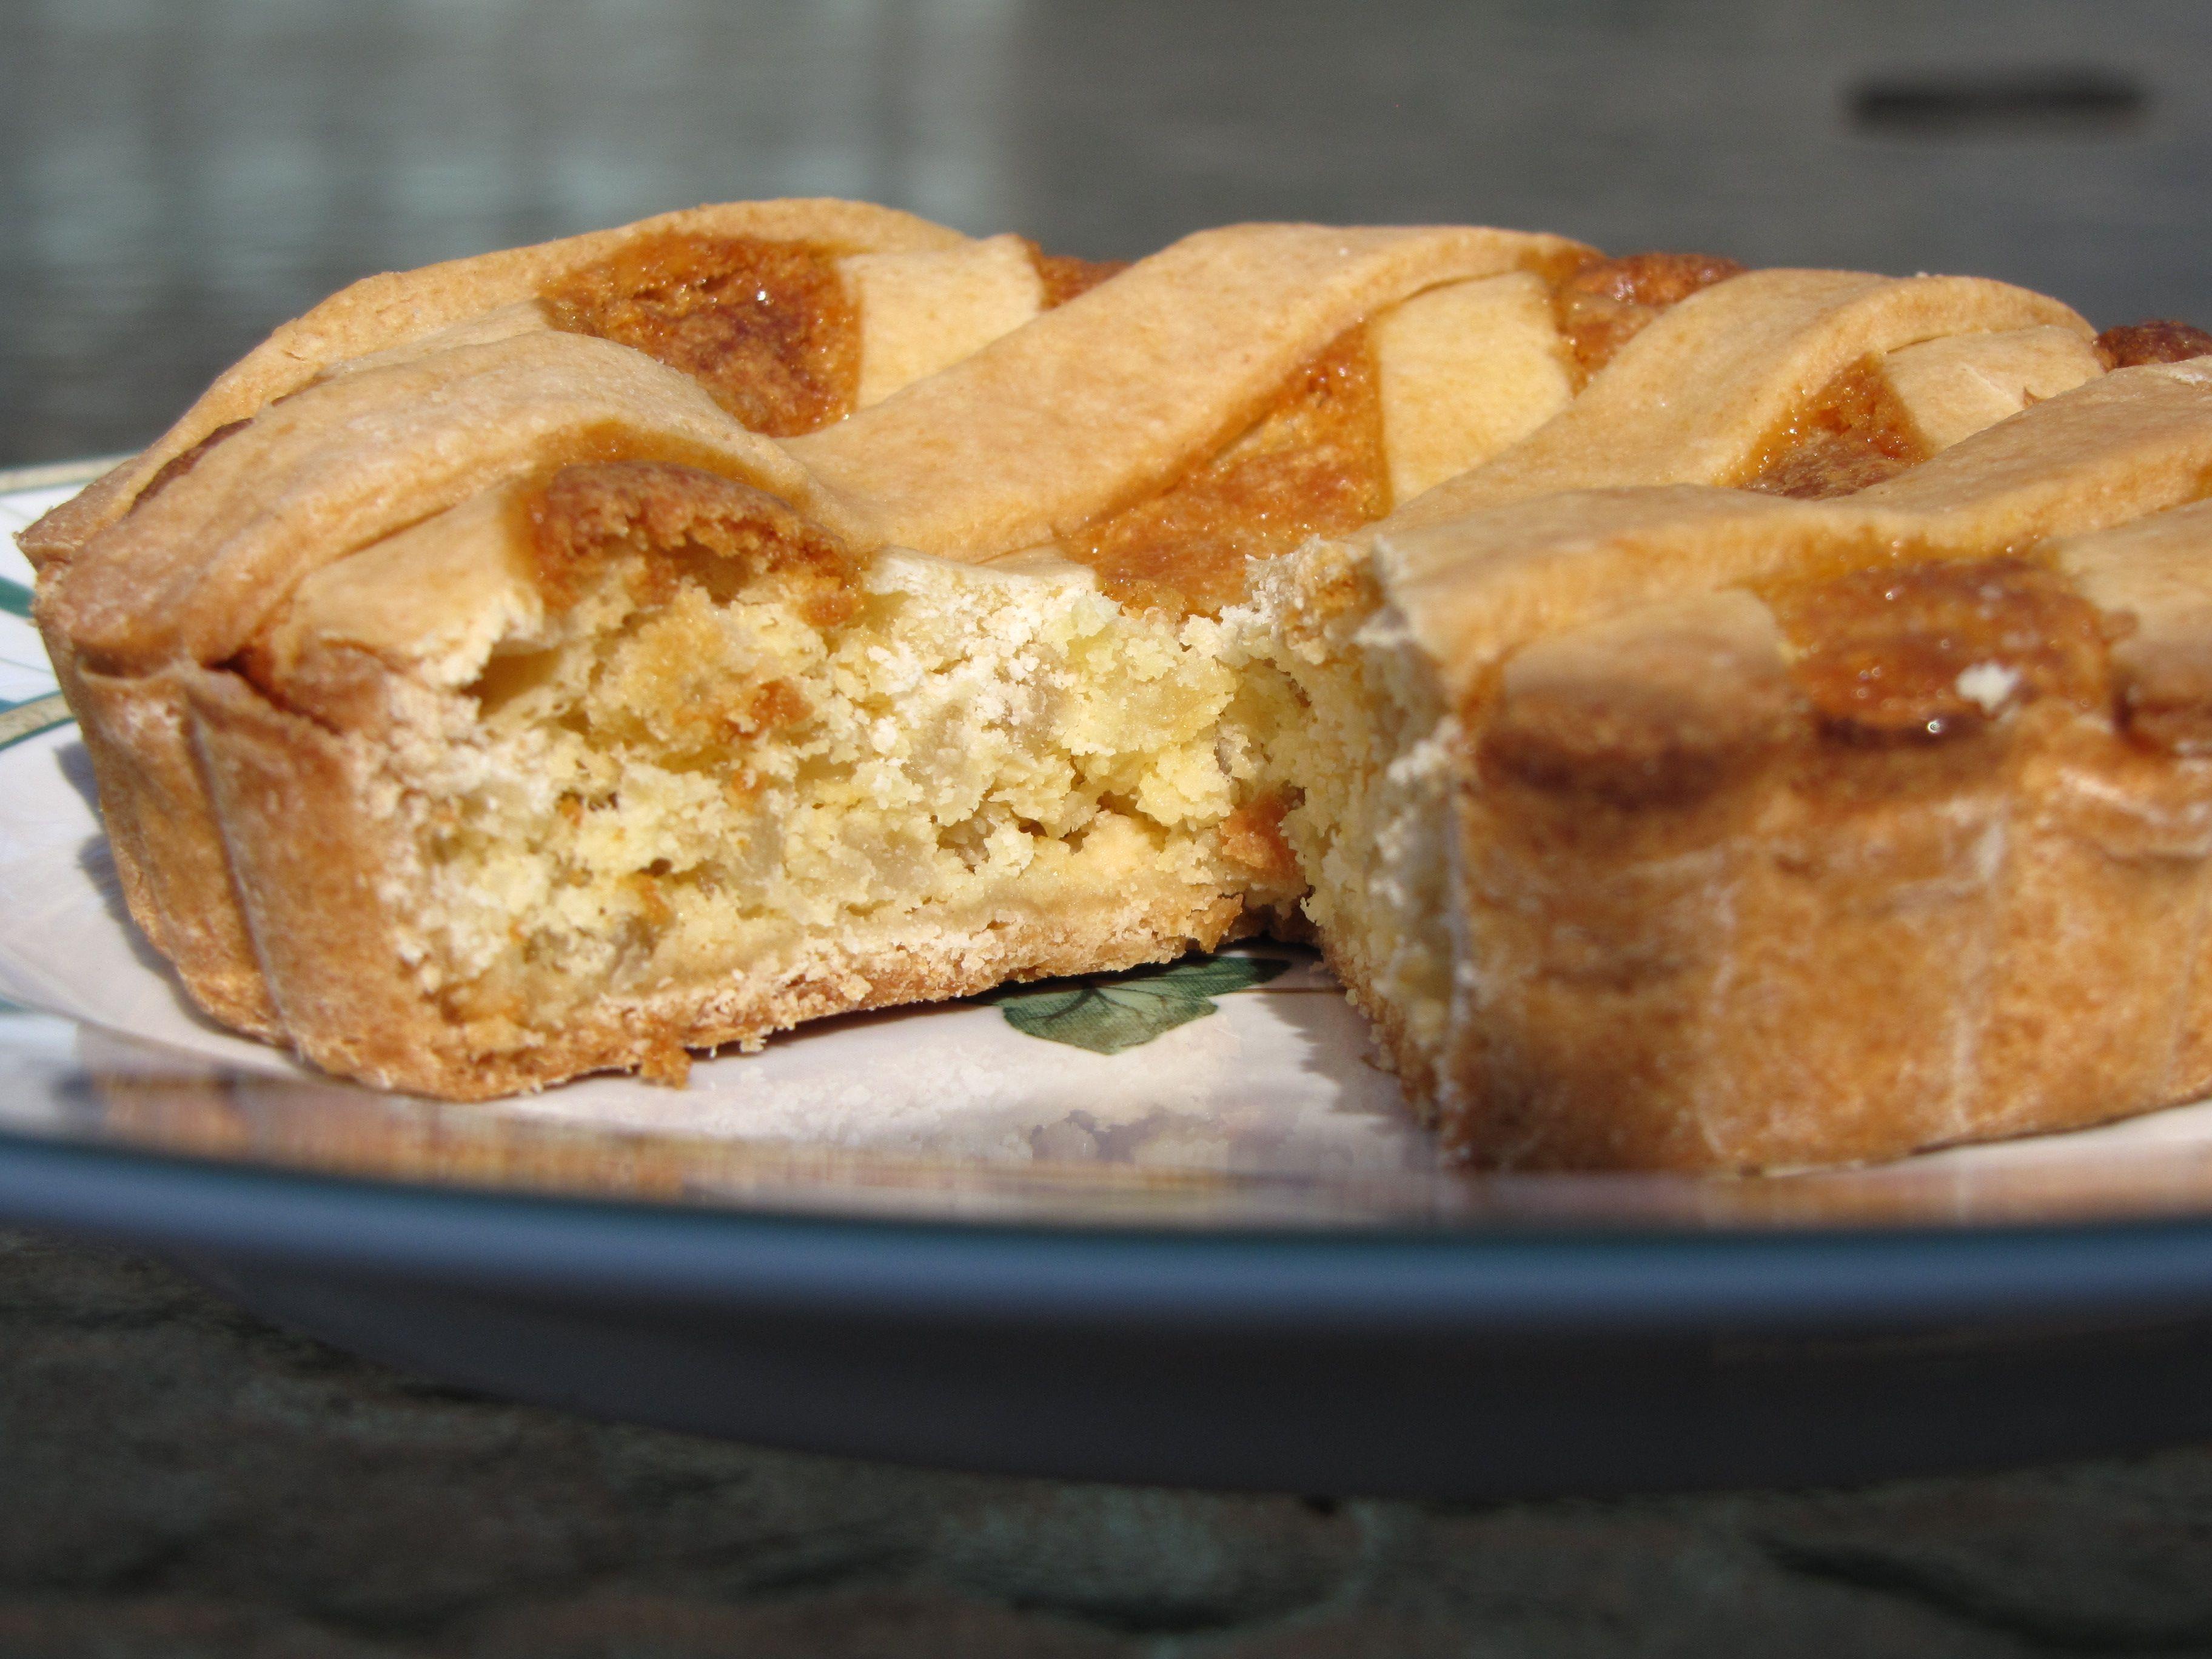 Italian Pastry Cake Recipes: Pastiera Di Grano This Pie Is One Of My Favorite Desserts